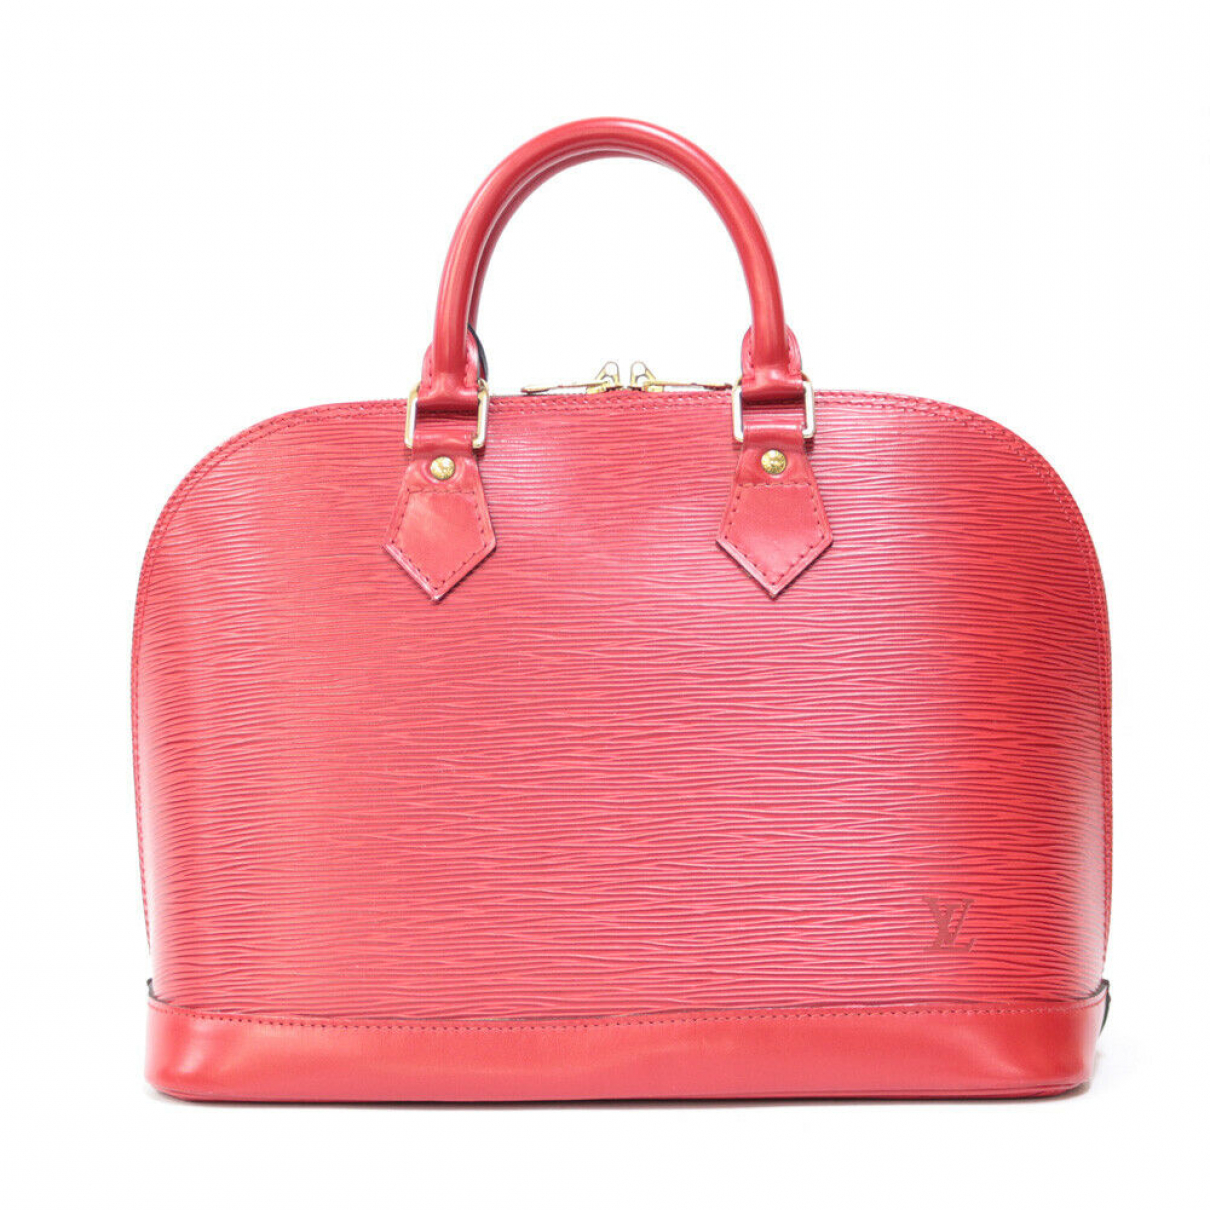 Louis Vuitton N Red Leather handbag for Women N